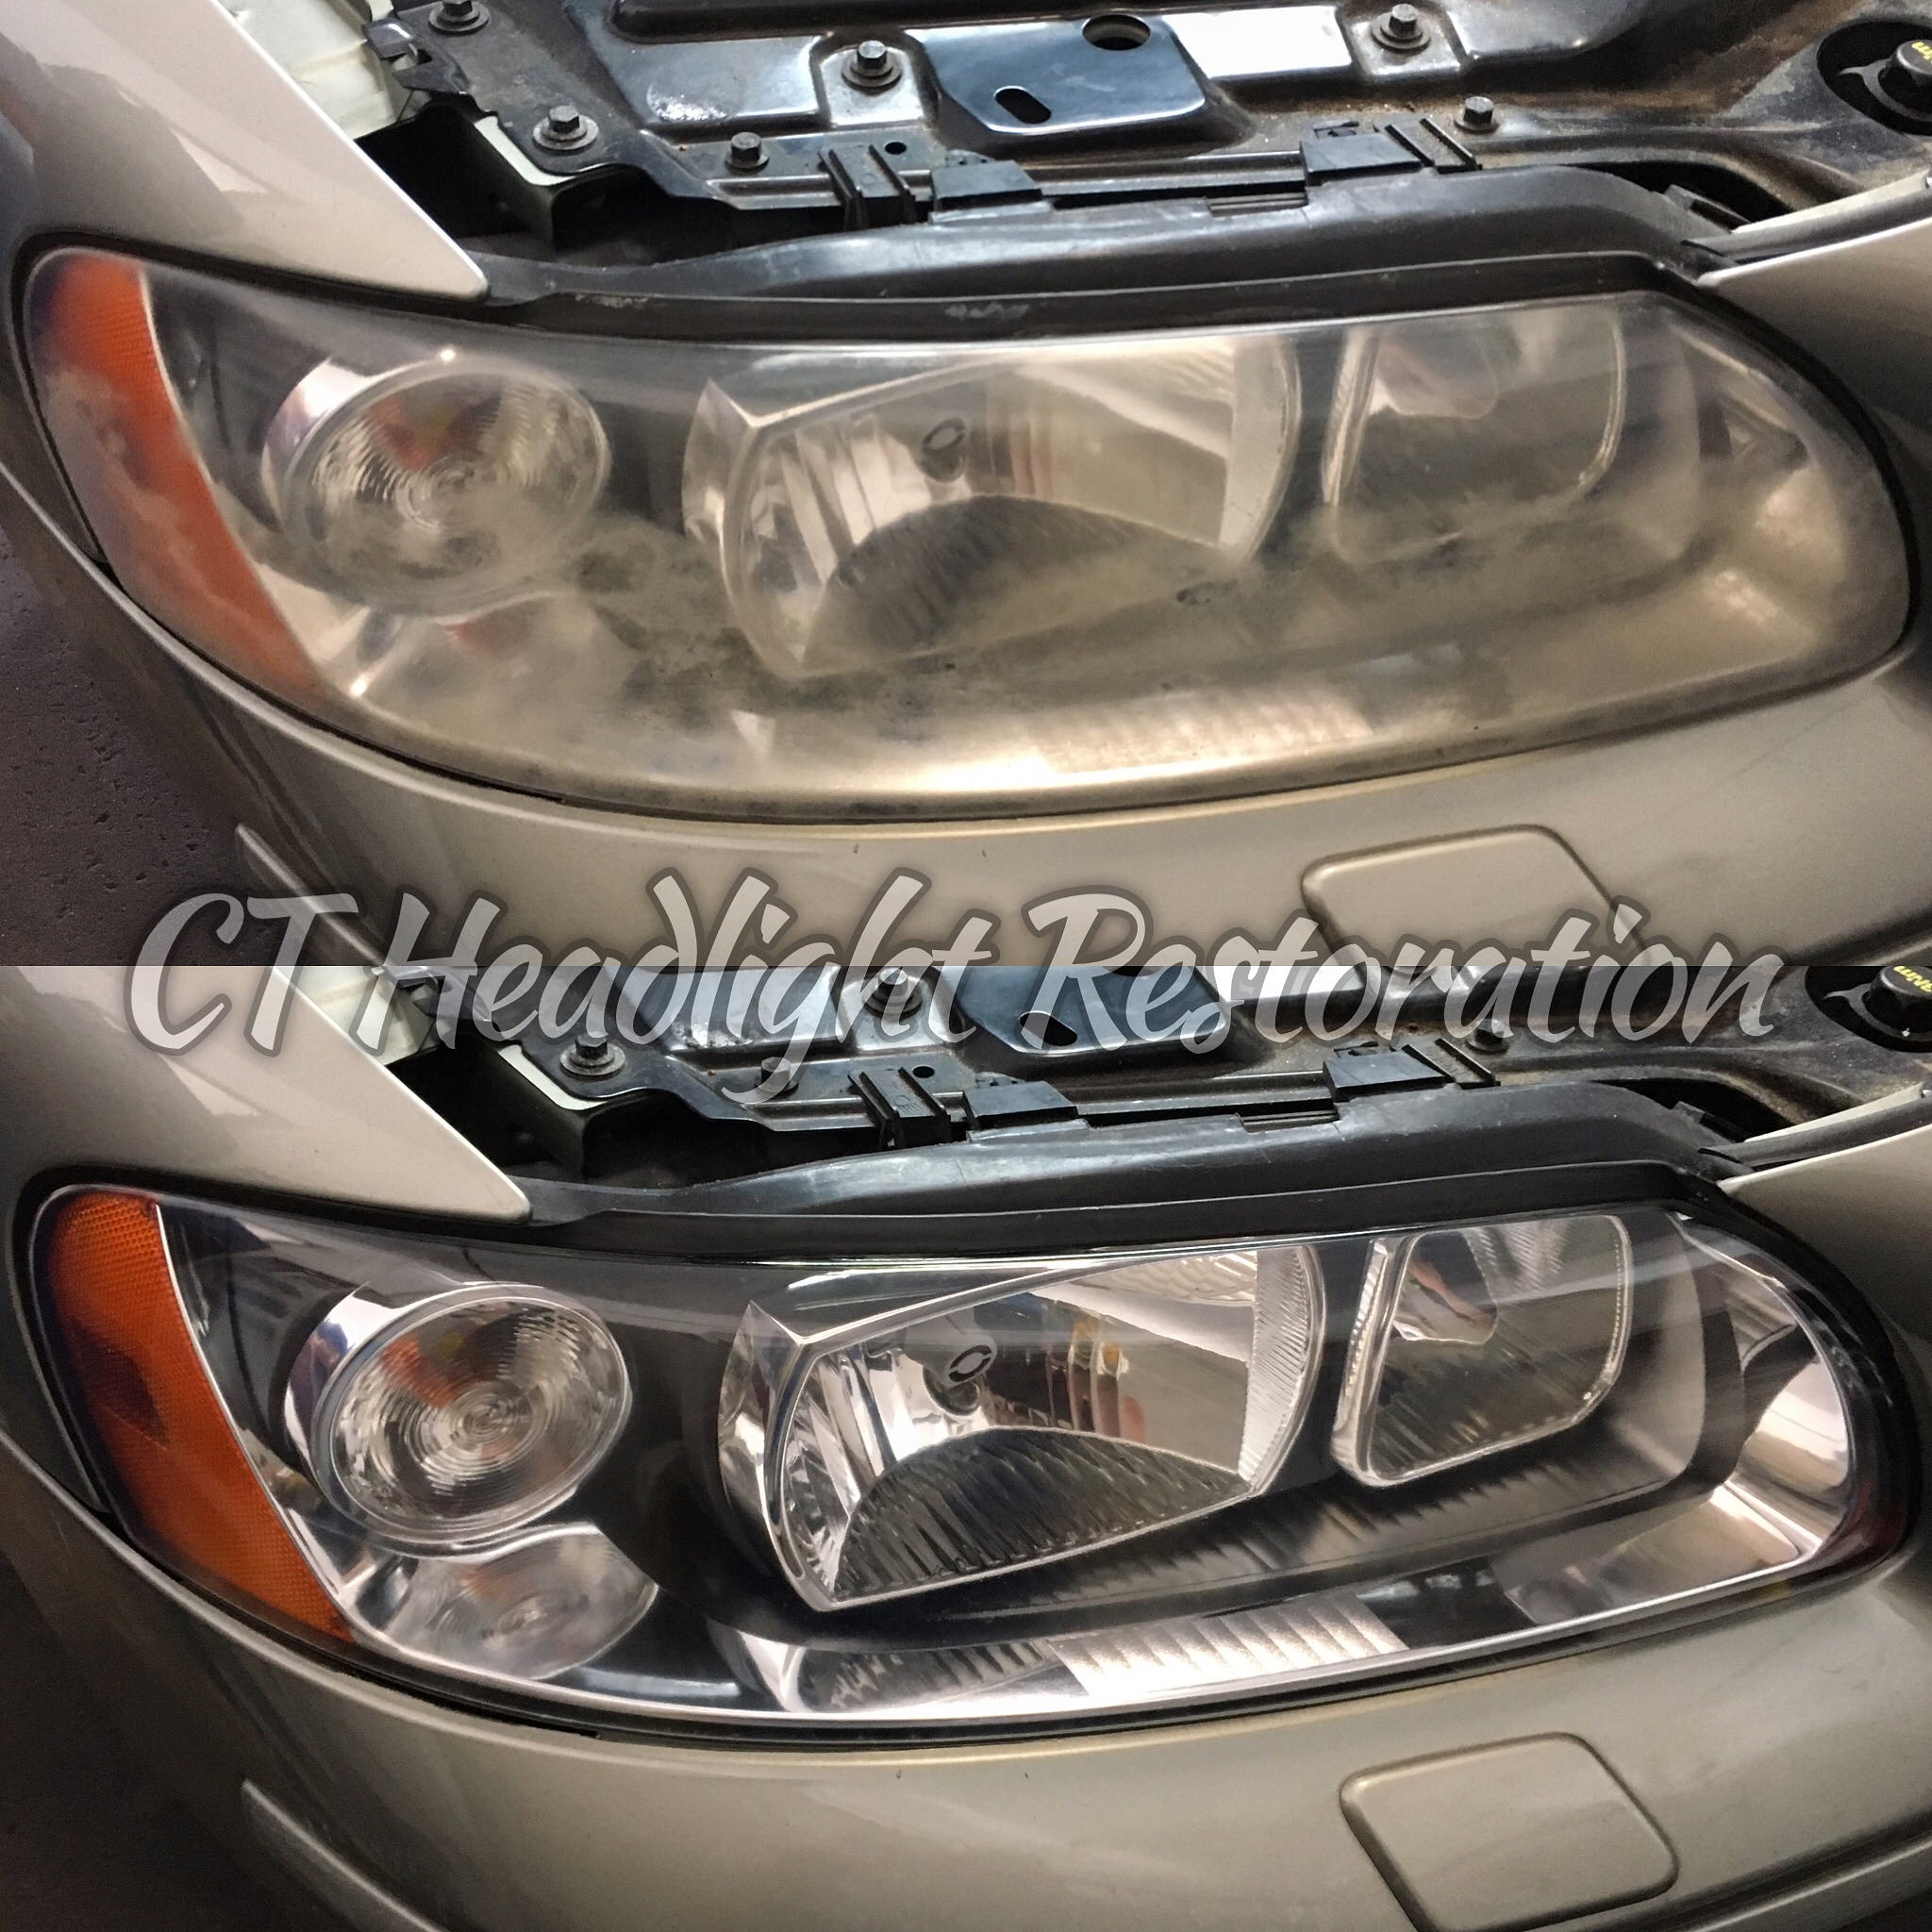 Volvo s60 Awesome Headlight Restoration.jpg